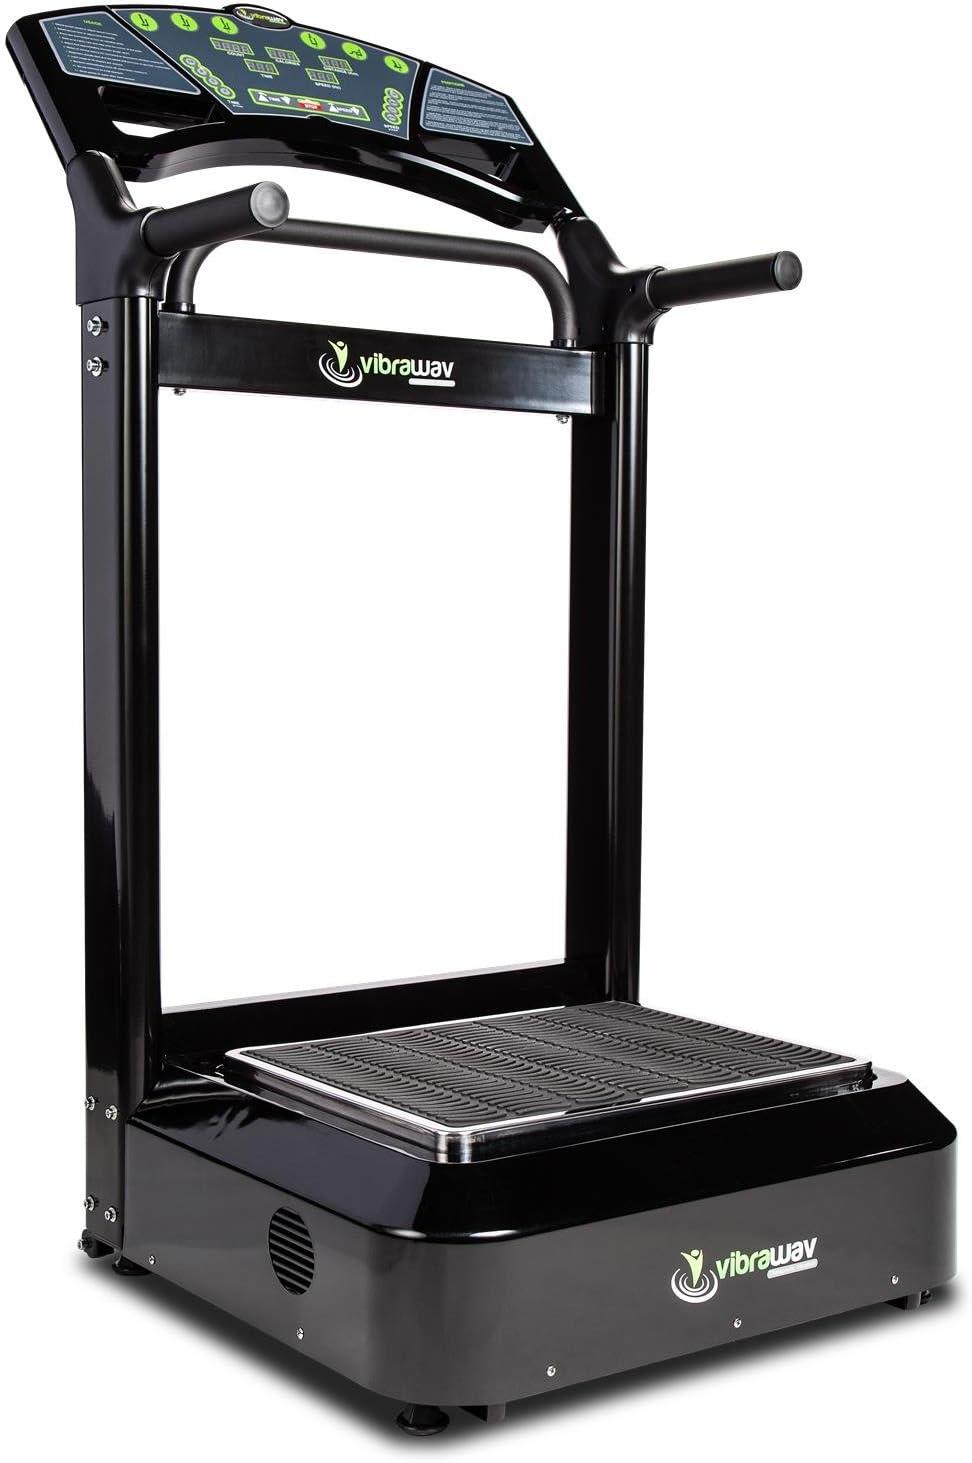 VibraWav Pro XT Whole Body Vibration Platform